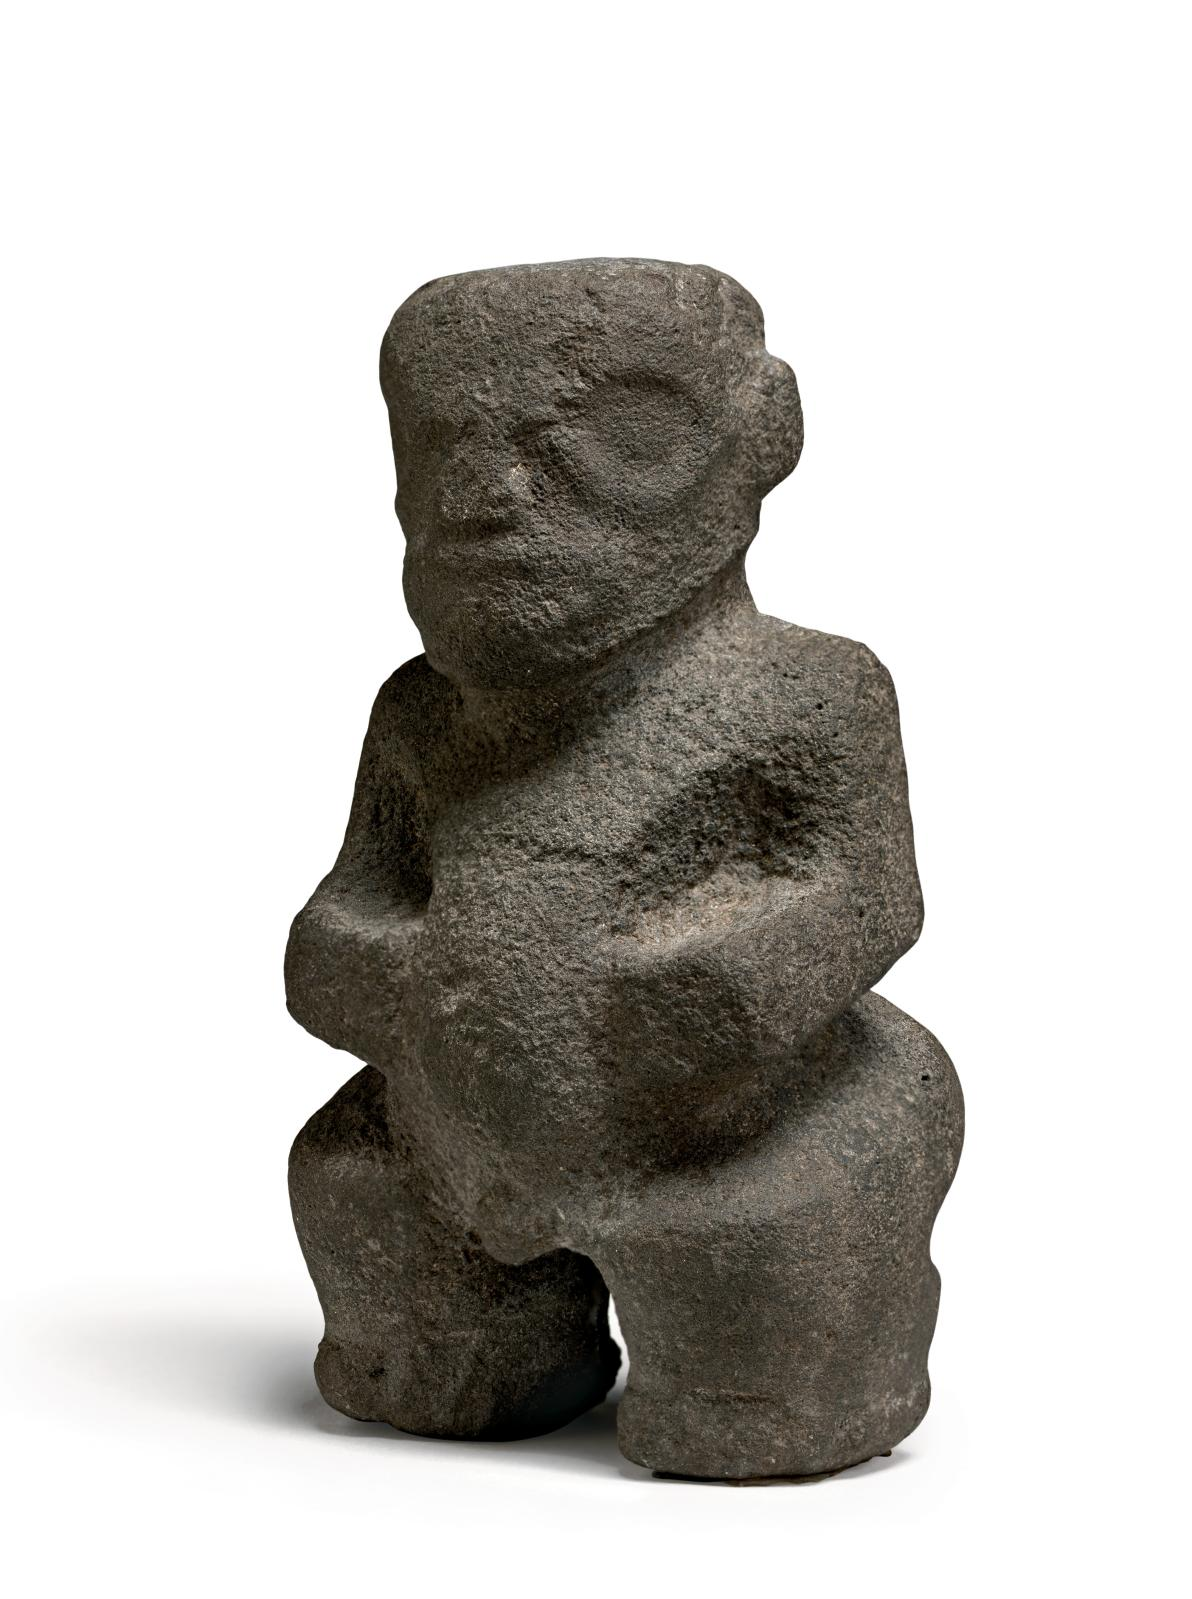 Iles Marquises, Polynésie française, XVIIIesiècle. Statue Tiki ke'a, basalte, 14,5 cm. © Michael Evans